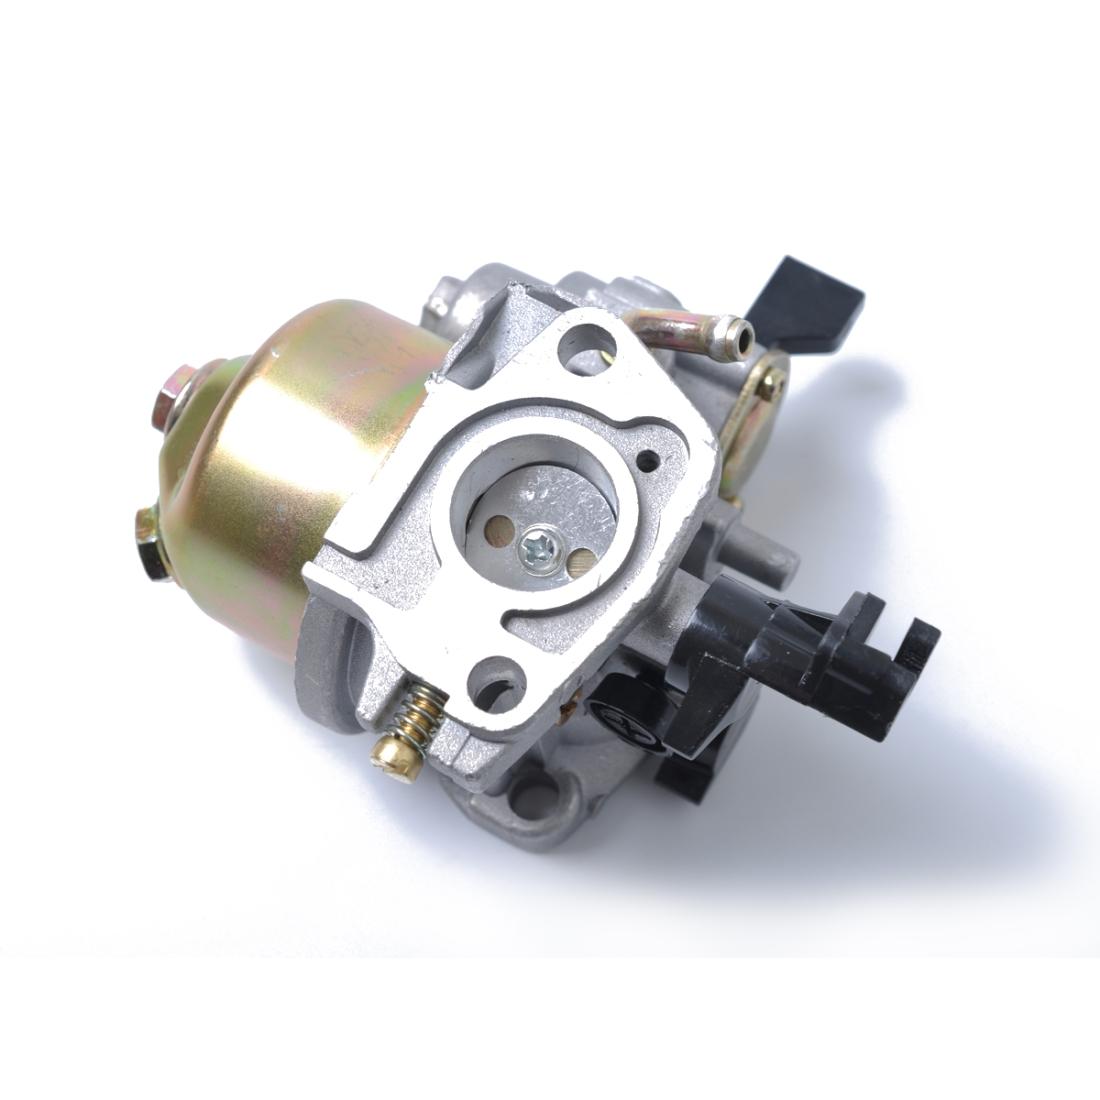 Cooling Fan For Honda GX160 GX200 168FA 168FB 170F 5.5HP 6.5HP.